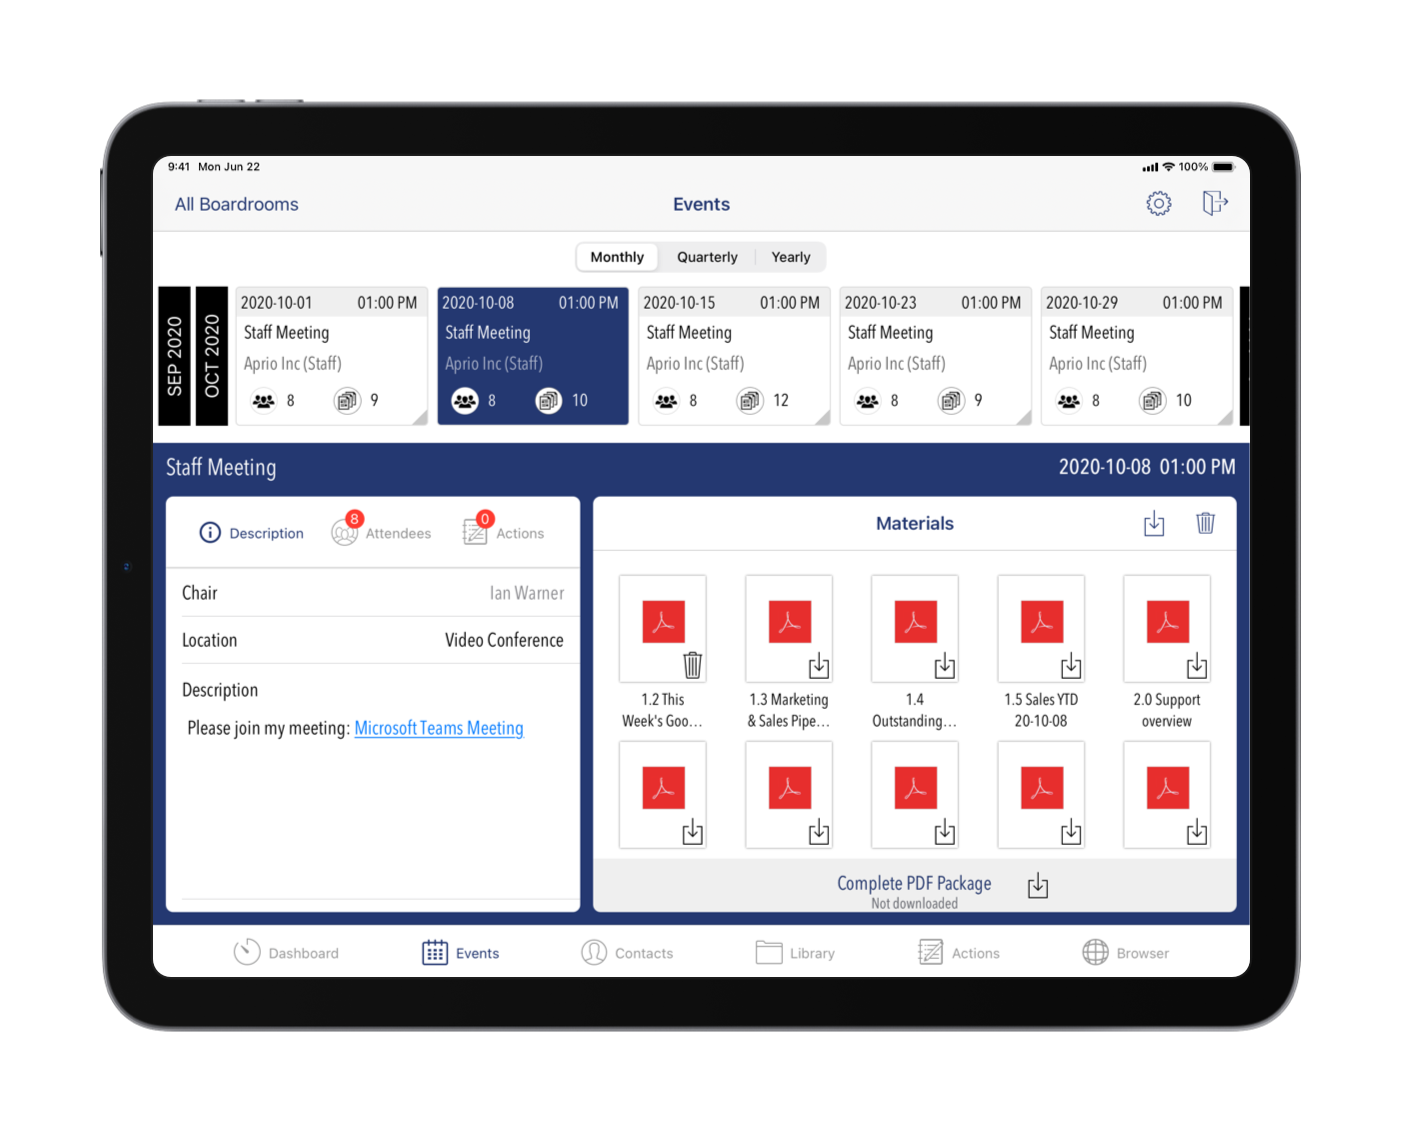 Aprio Software - Events Library & Agenda